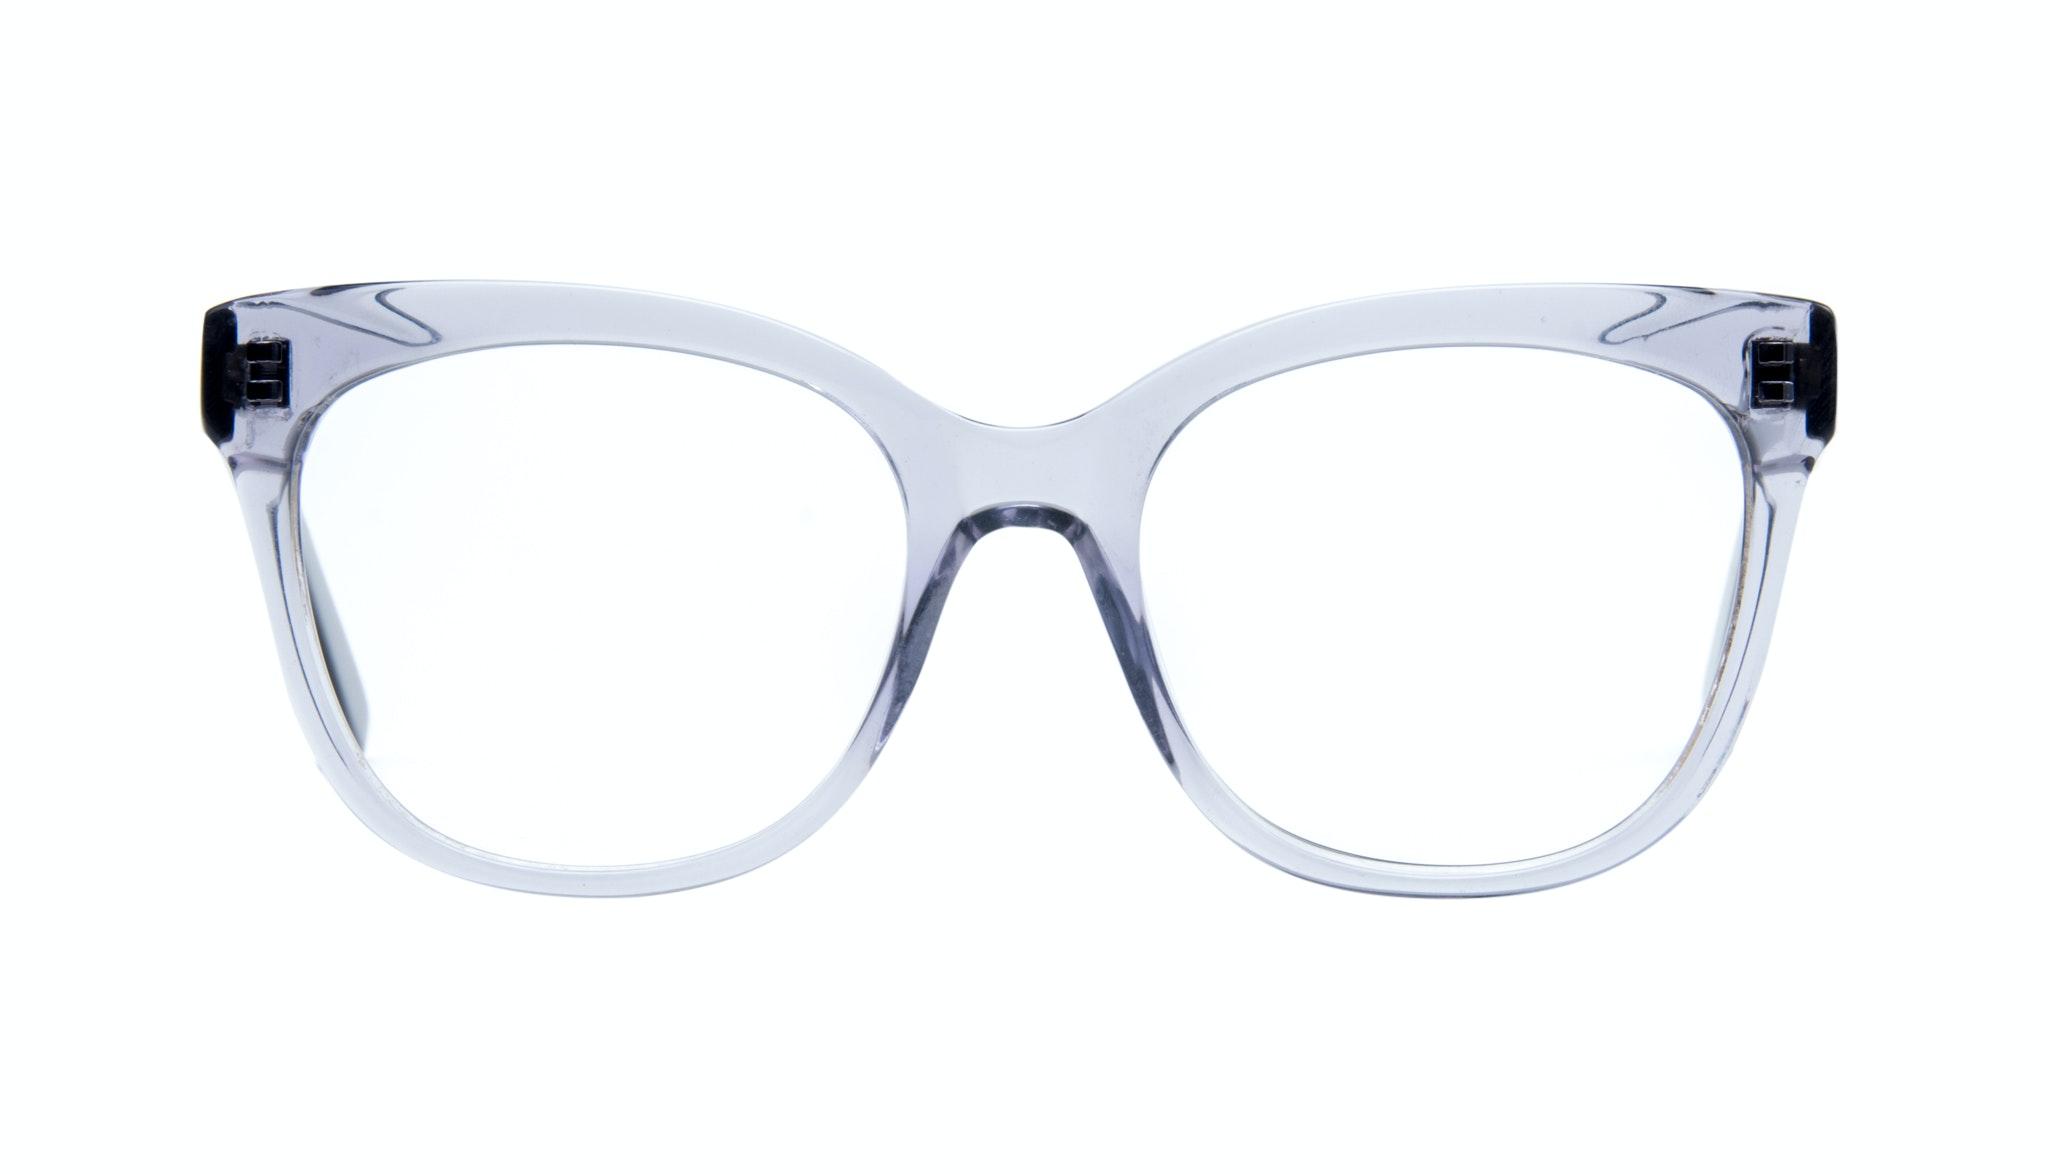 Affordable Fashion Glasses Square Eyeglasses Women Breezy Grey Metal Front